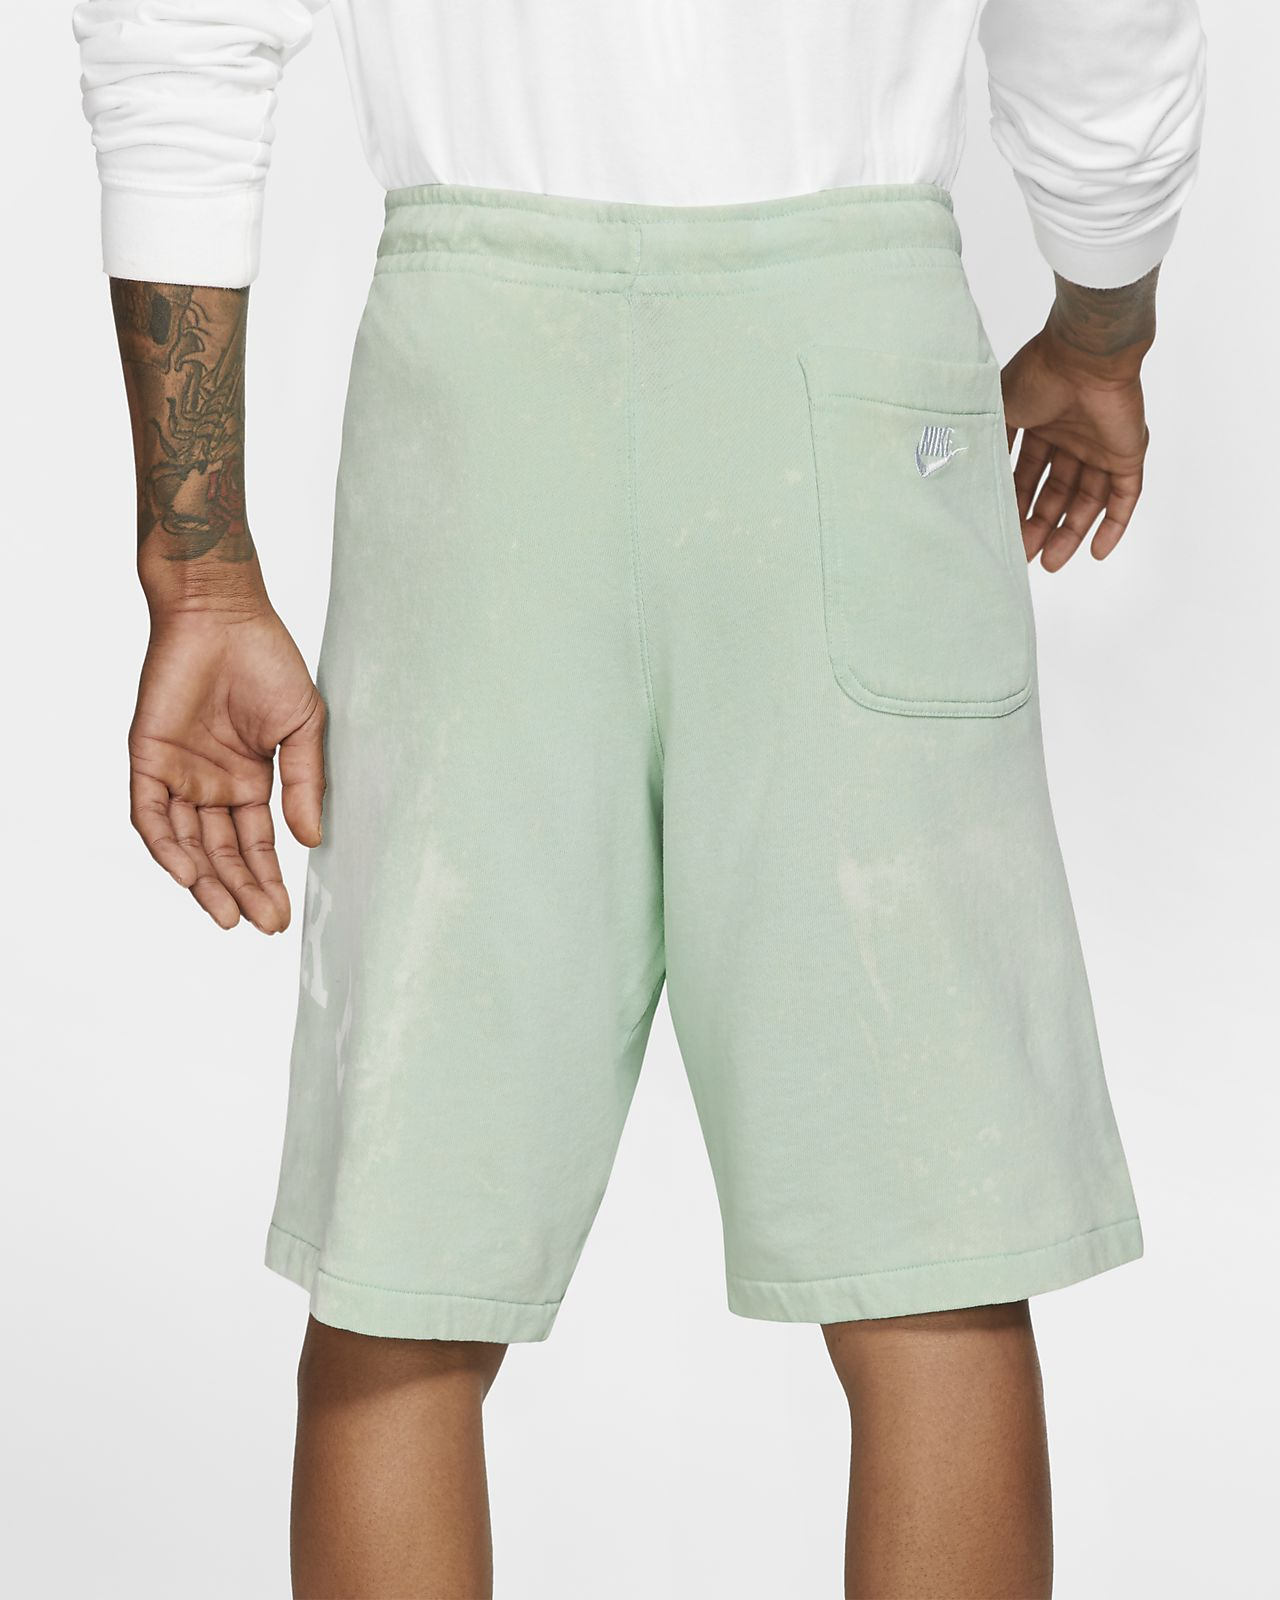 7c64b313ce7 Σορτς από ύφασμα French Terry Nike Sportswear